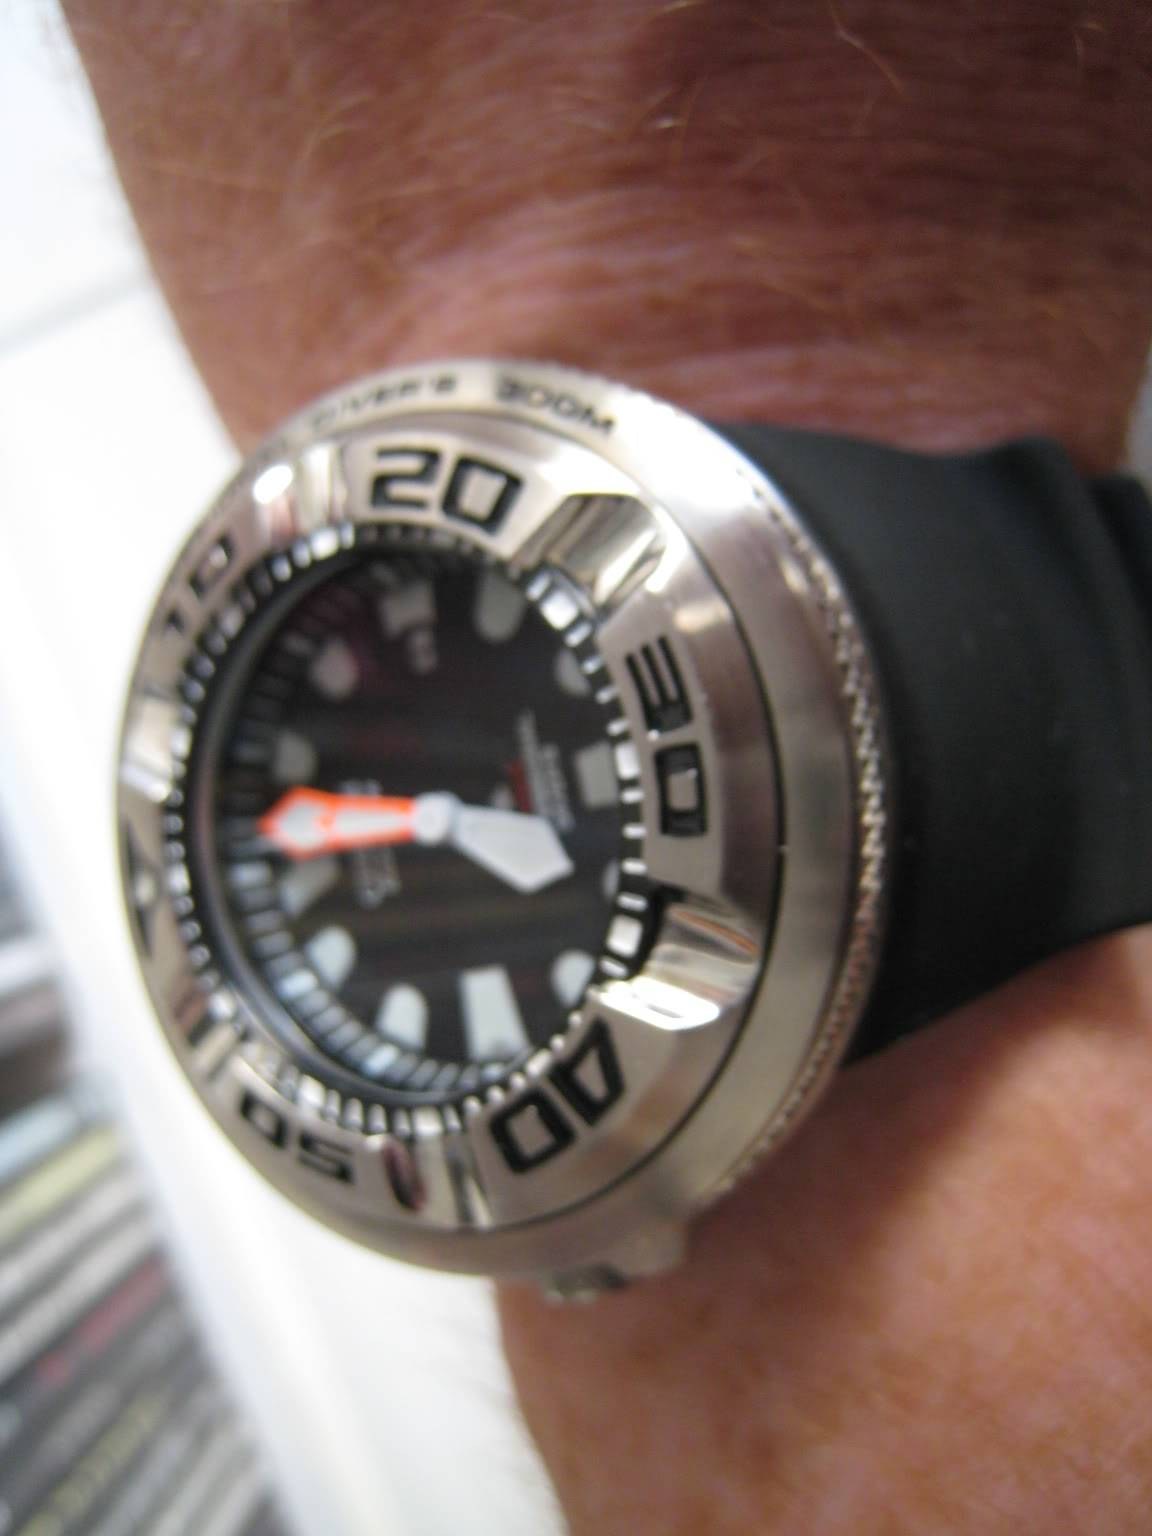 Citizen Aqualand Duplex Professional Diving Watch IMG_2336